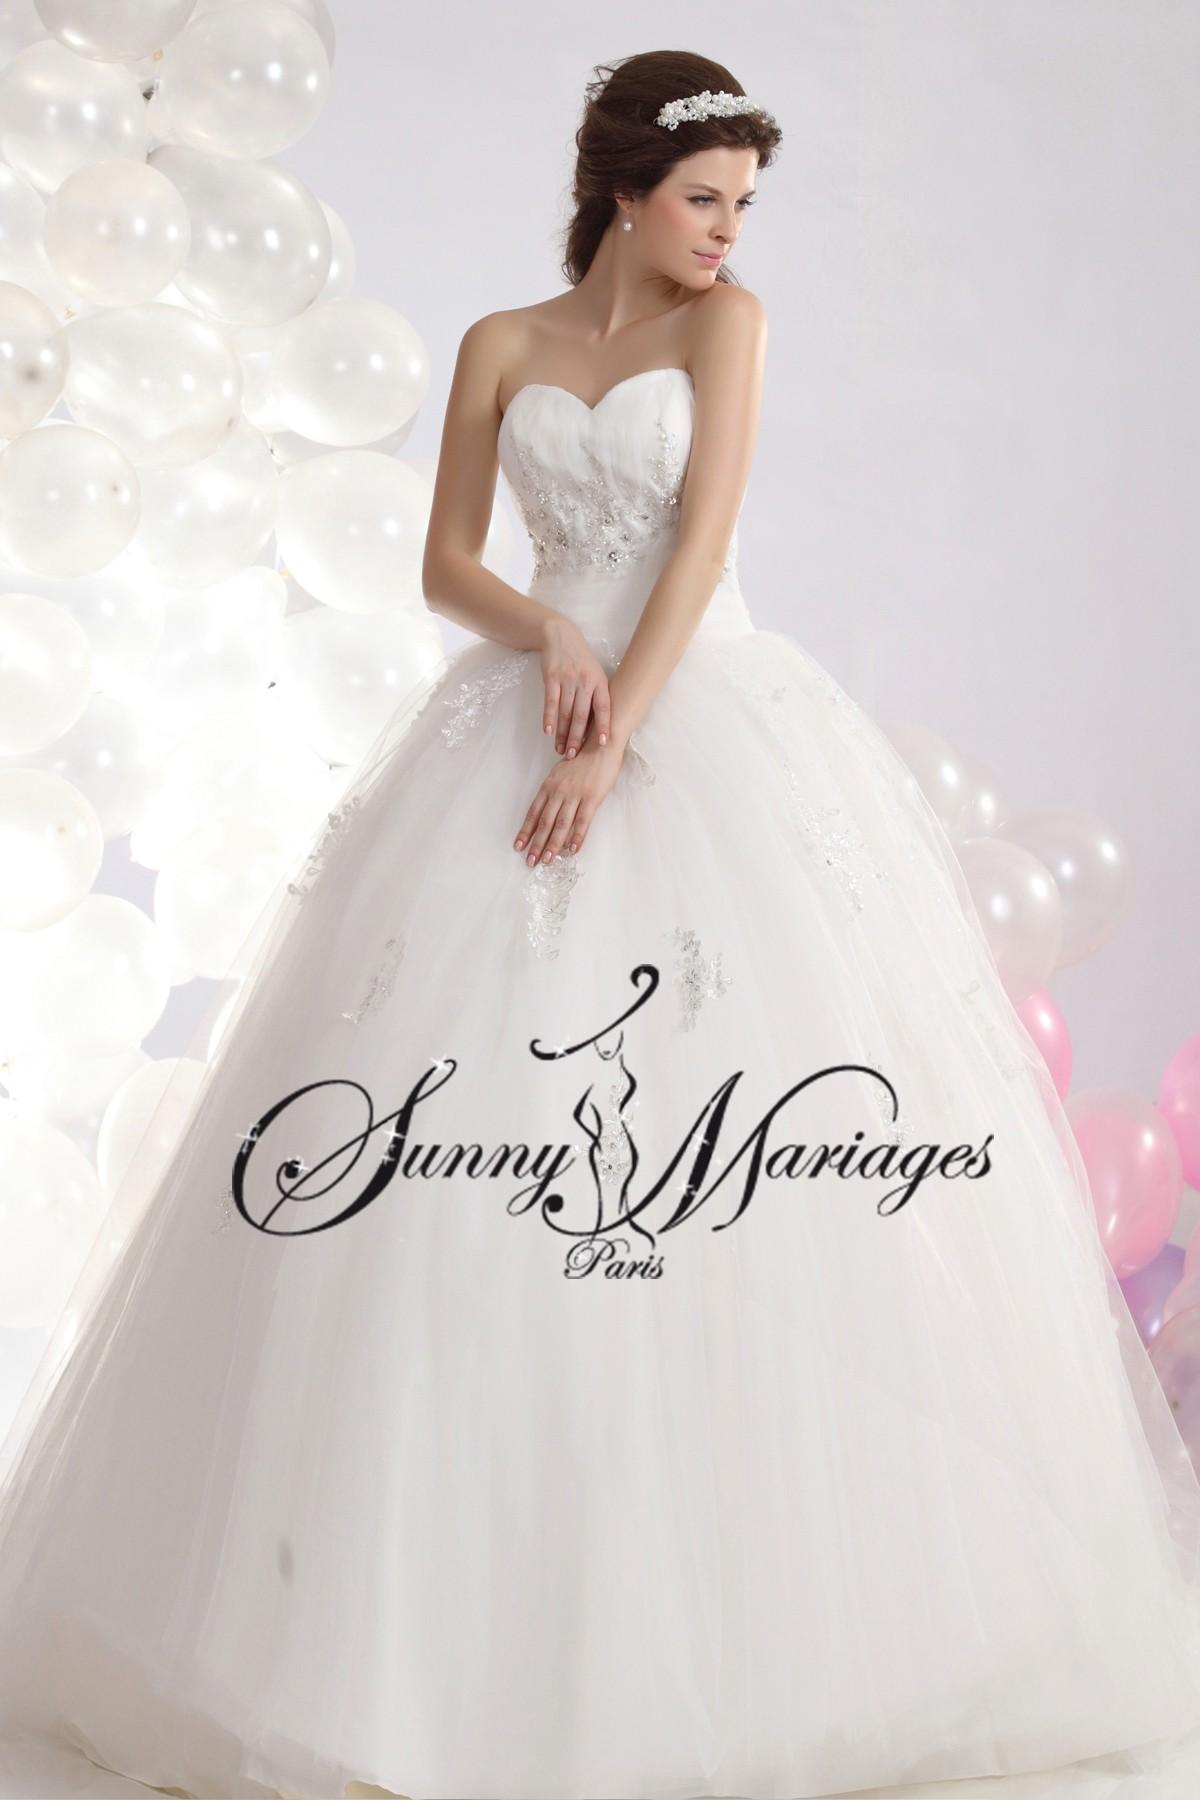 ... » robe de mariée » Robe de mariee bustier princesse « Tara